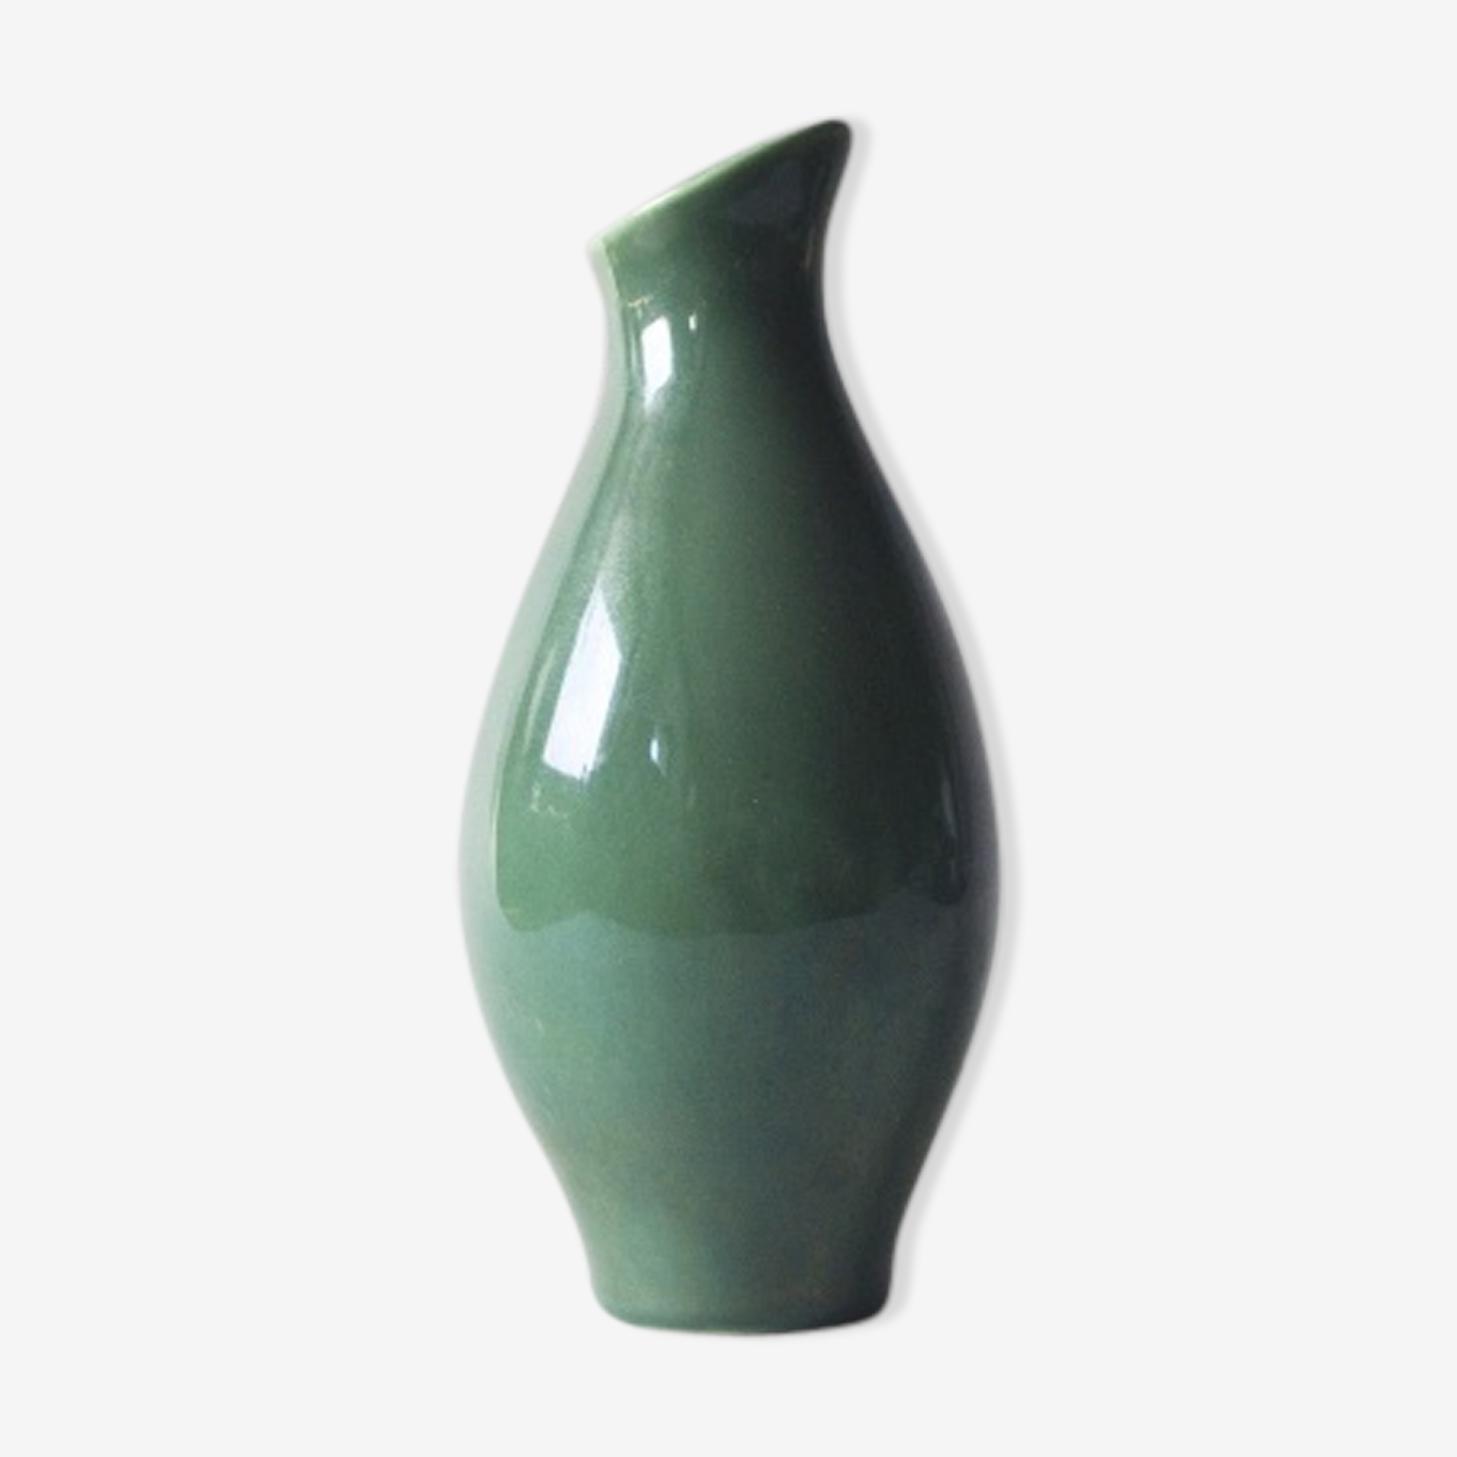 Vase vert années 80 Villeroy & Boch